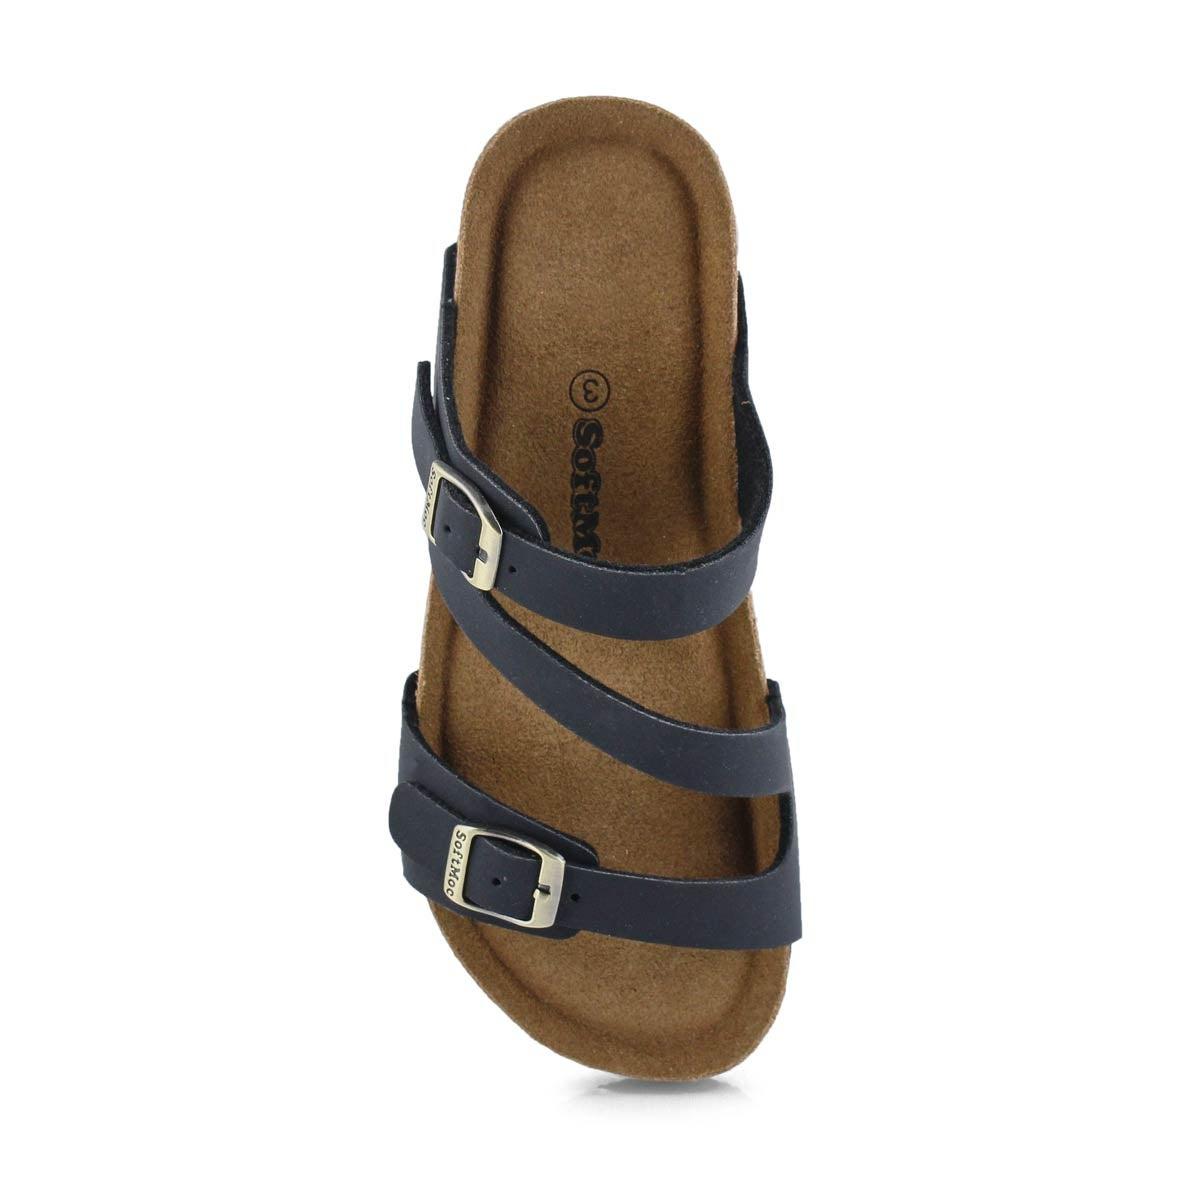 Grls Avalon 5 blk crz memory foam sandal